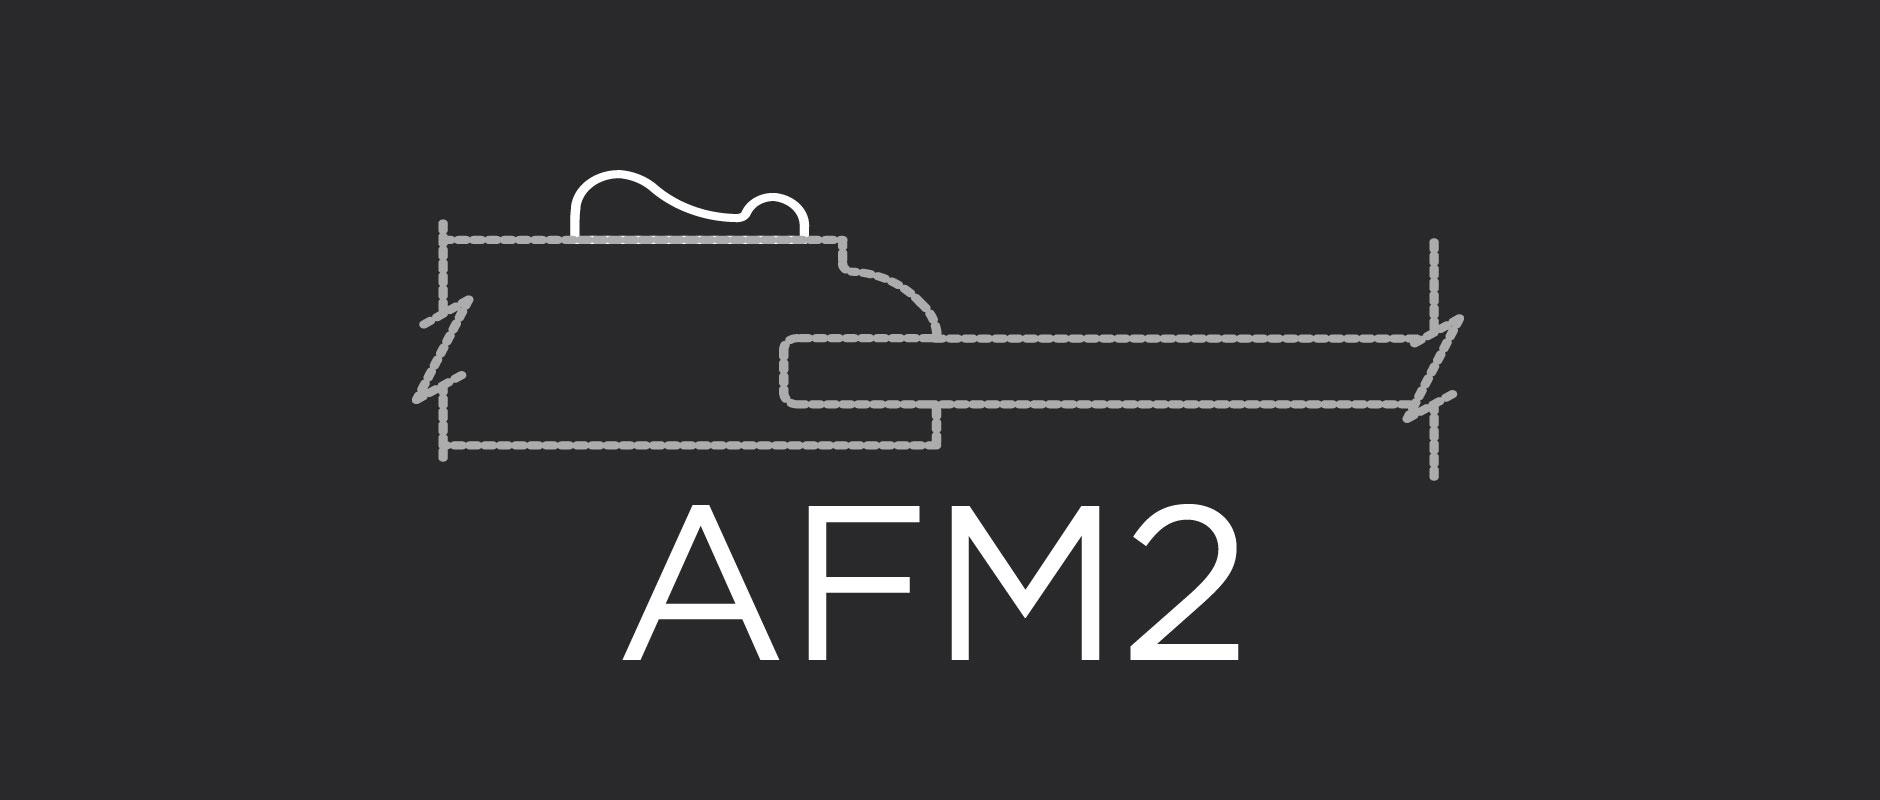 AFM2 face applied molding